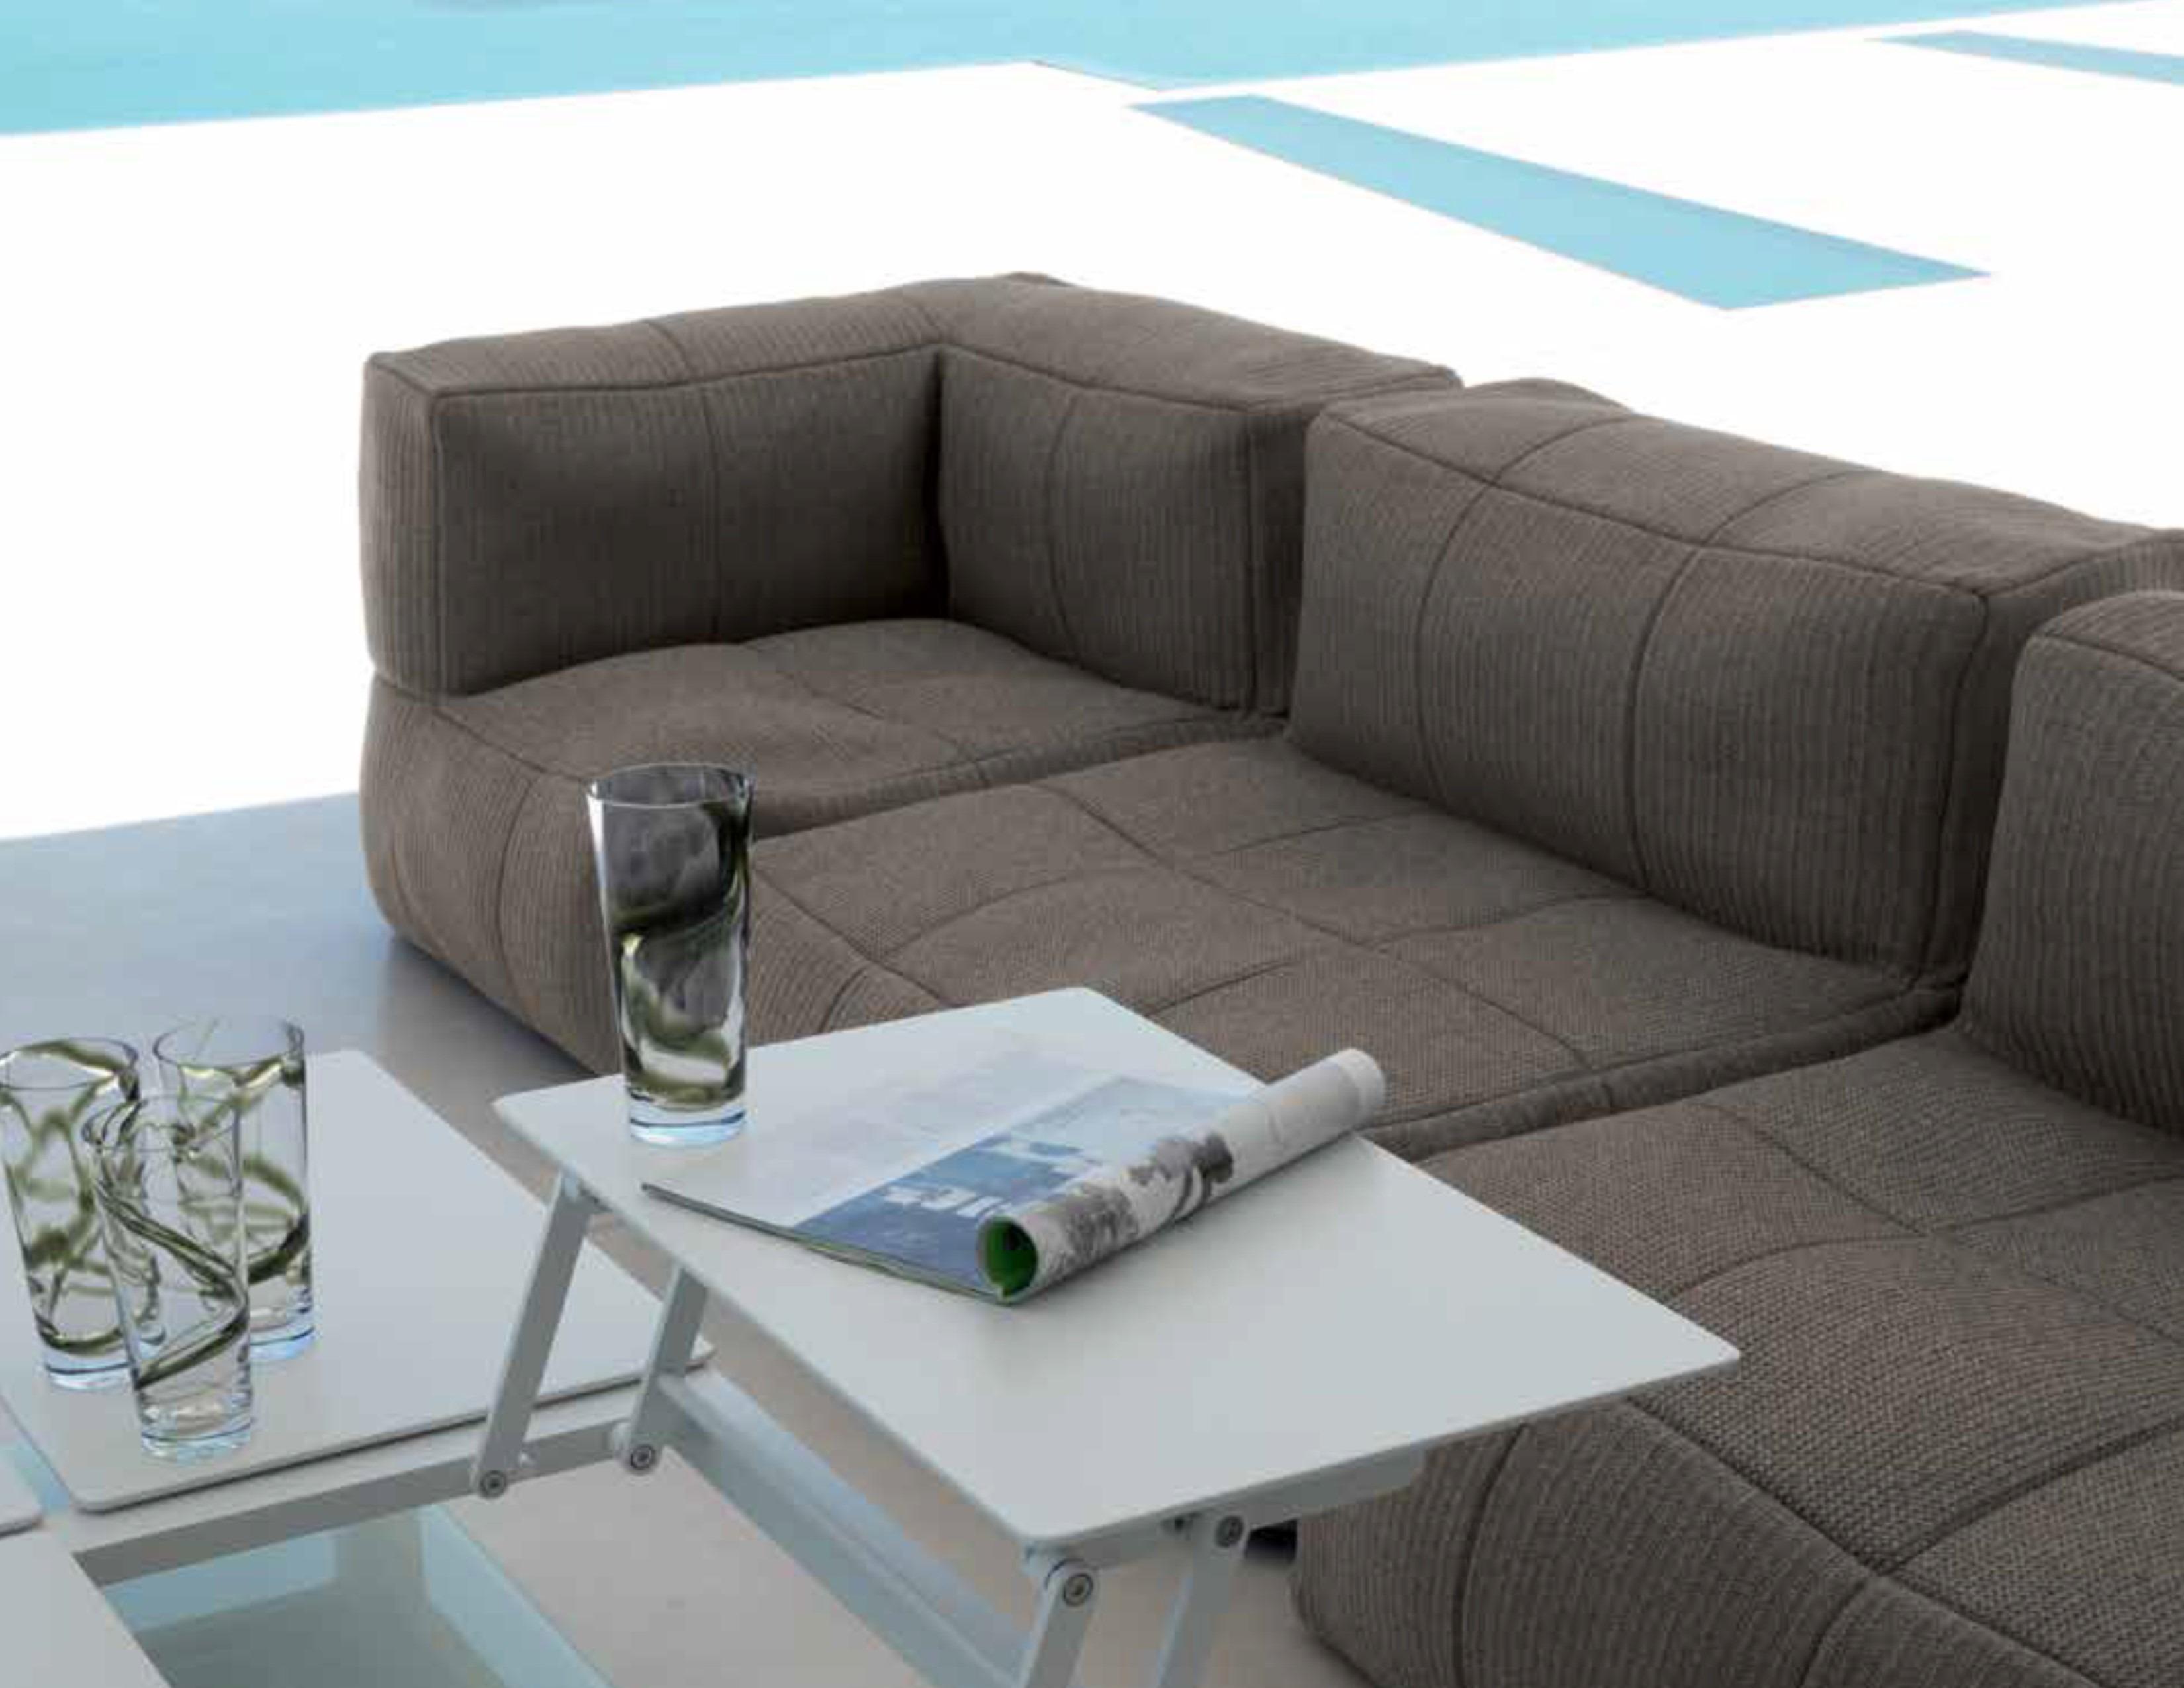 sunbrella fabric sectional sofas zanotta sofa bruce preis bella beanbag modular couture outdoor modern lounge bean bag luxury ibiza hotel contract design